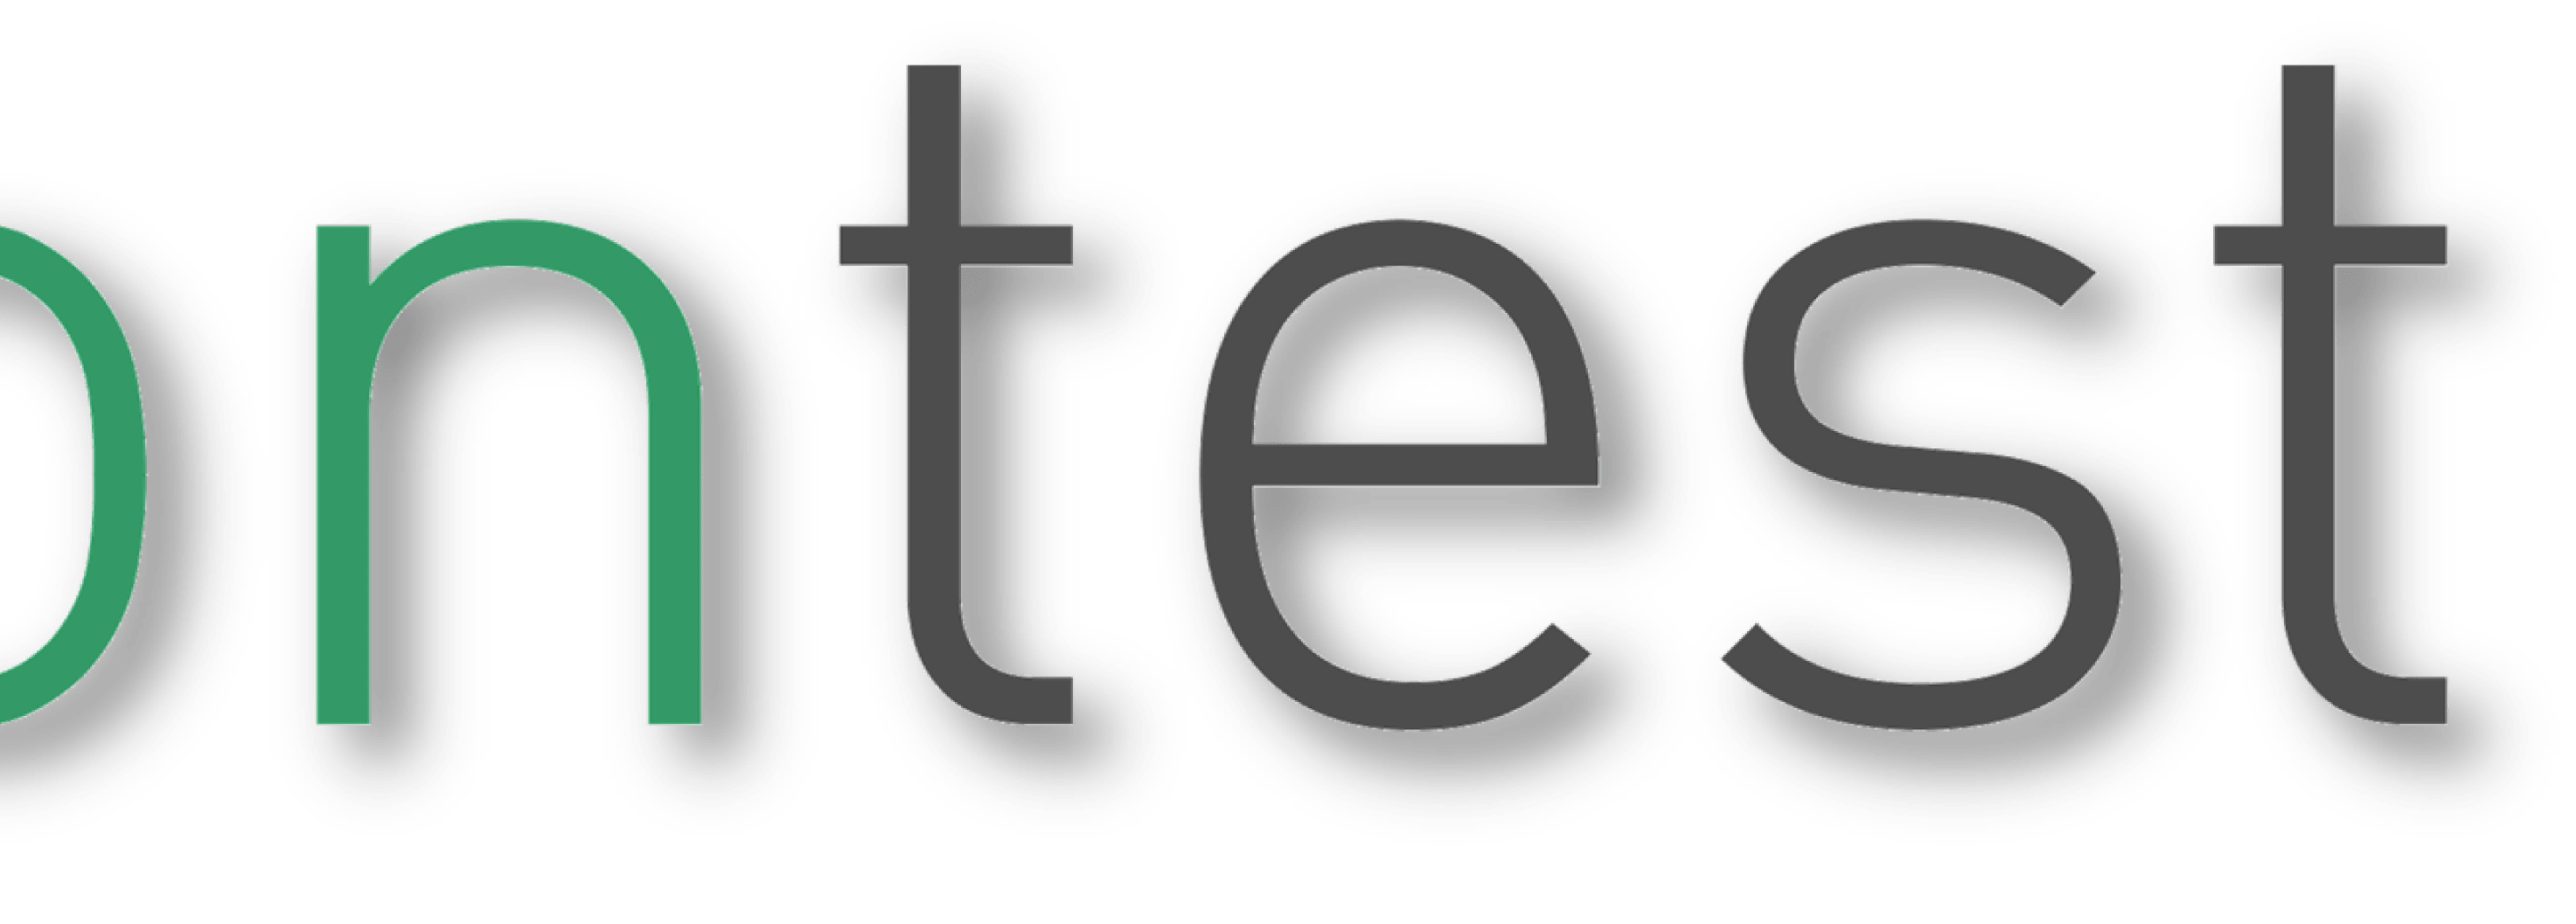 On test 1.0 beta